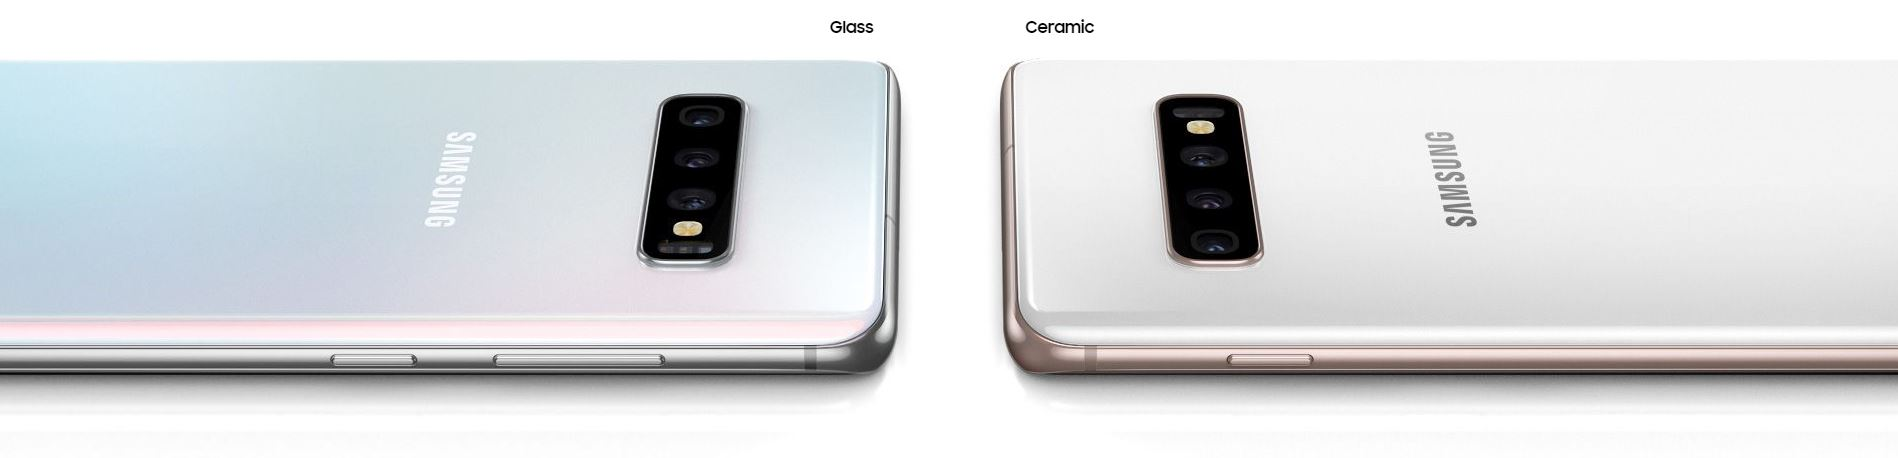 Samsung Galaxy S10 Range Materials | Junk Mail